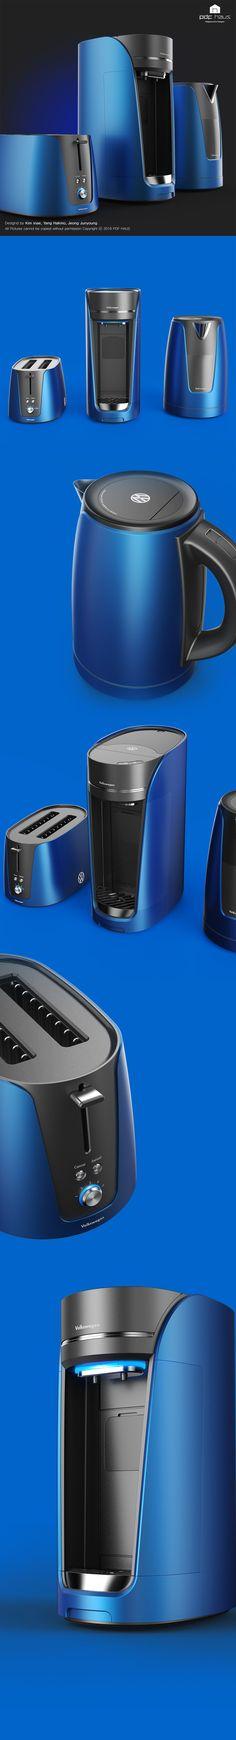 Volkswagen / Kitchen appliance / Product design / Industrial design / 제품디자인 / 산업디자인 / 디자인교육_PDF HAUS Design Academy